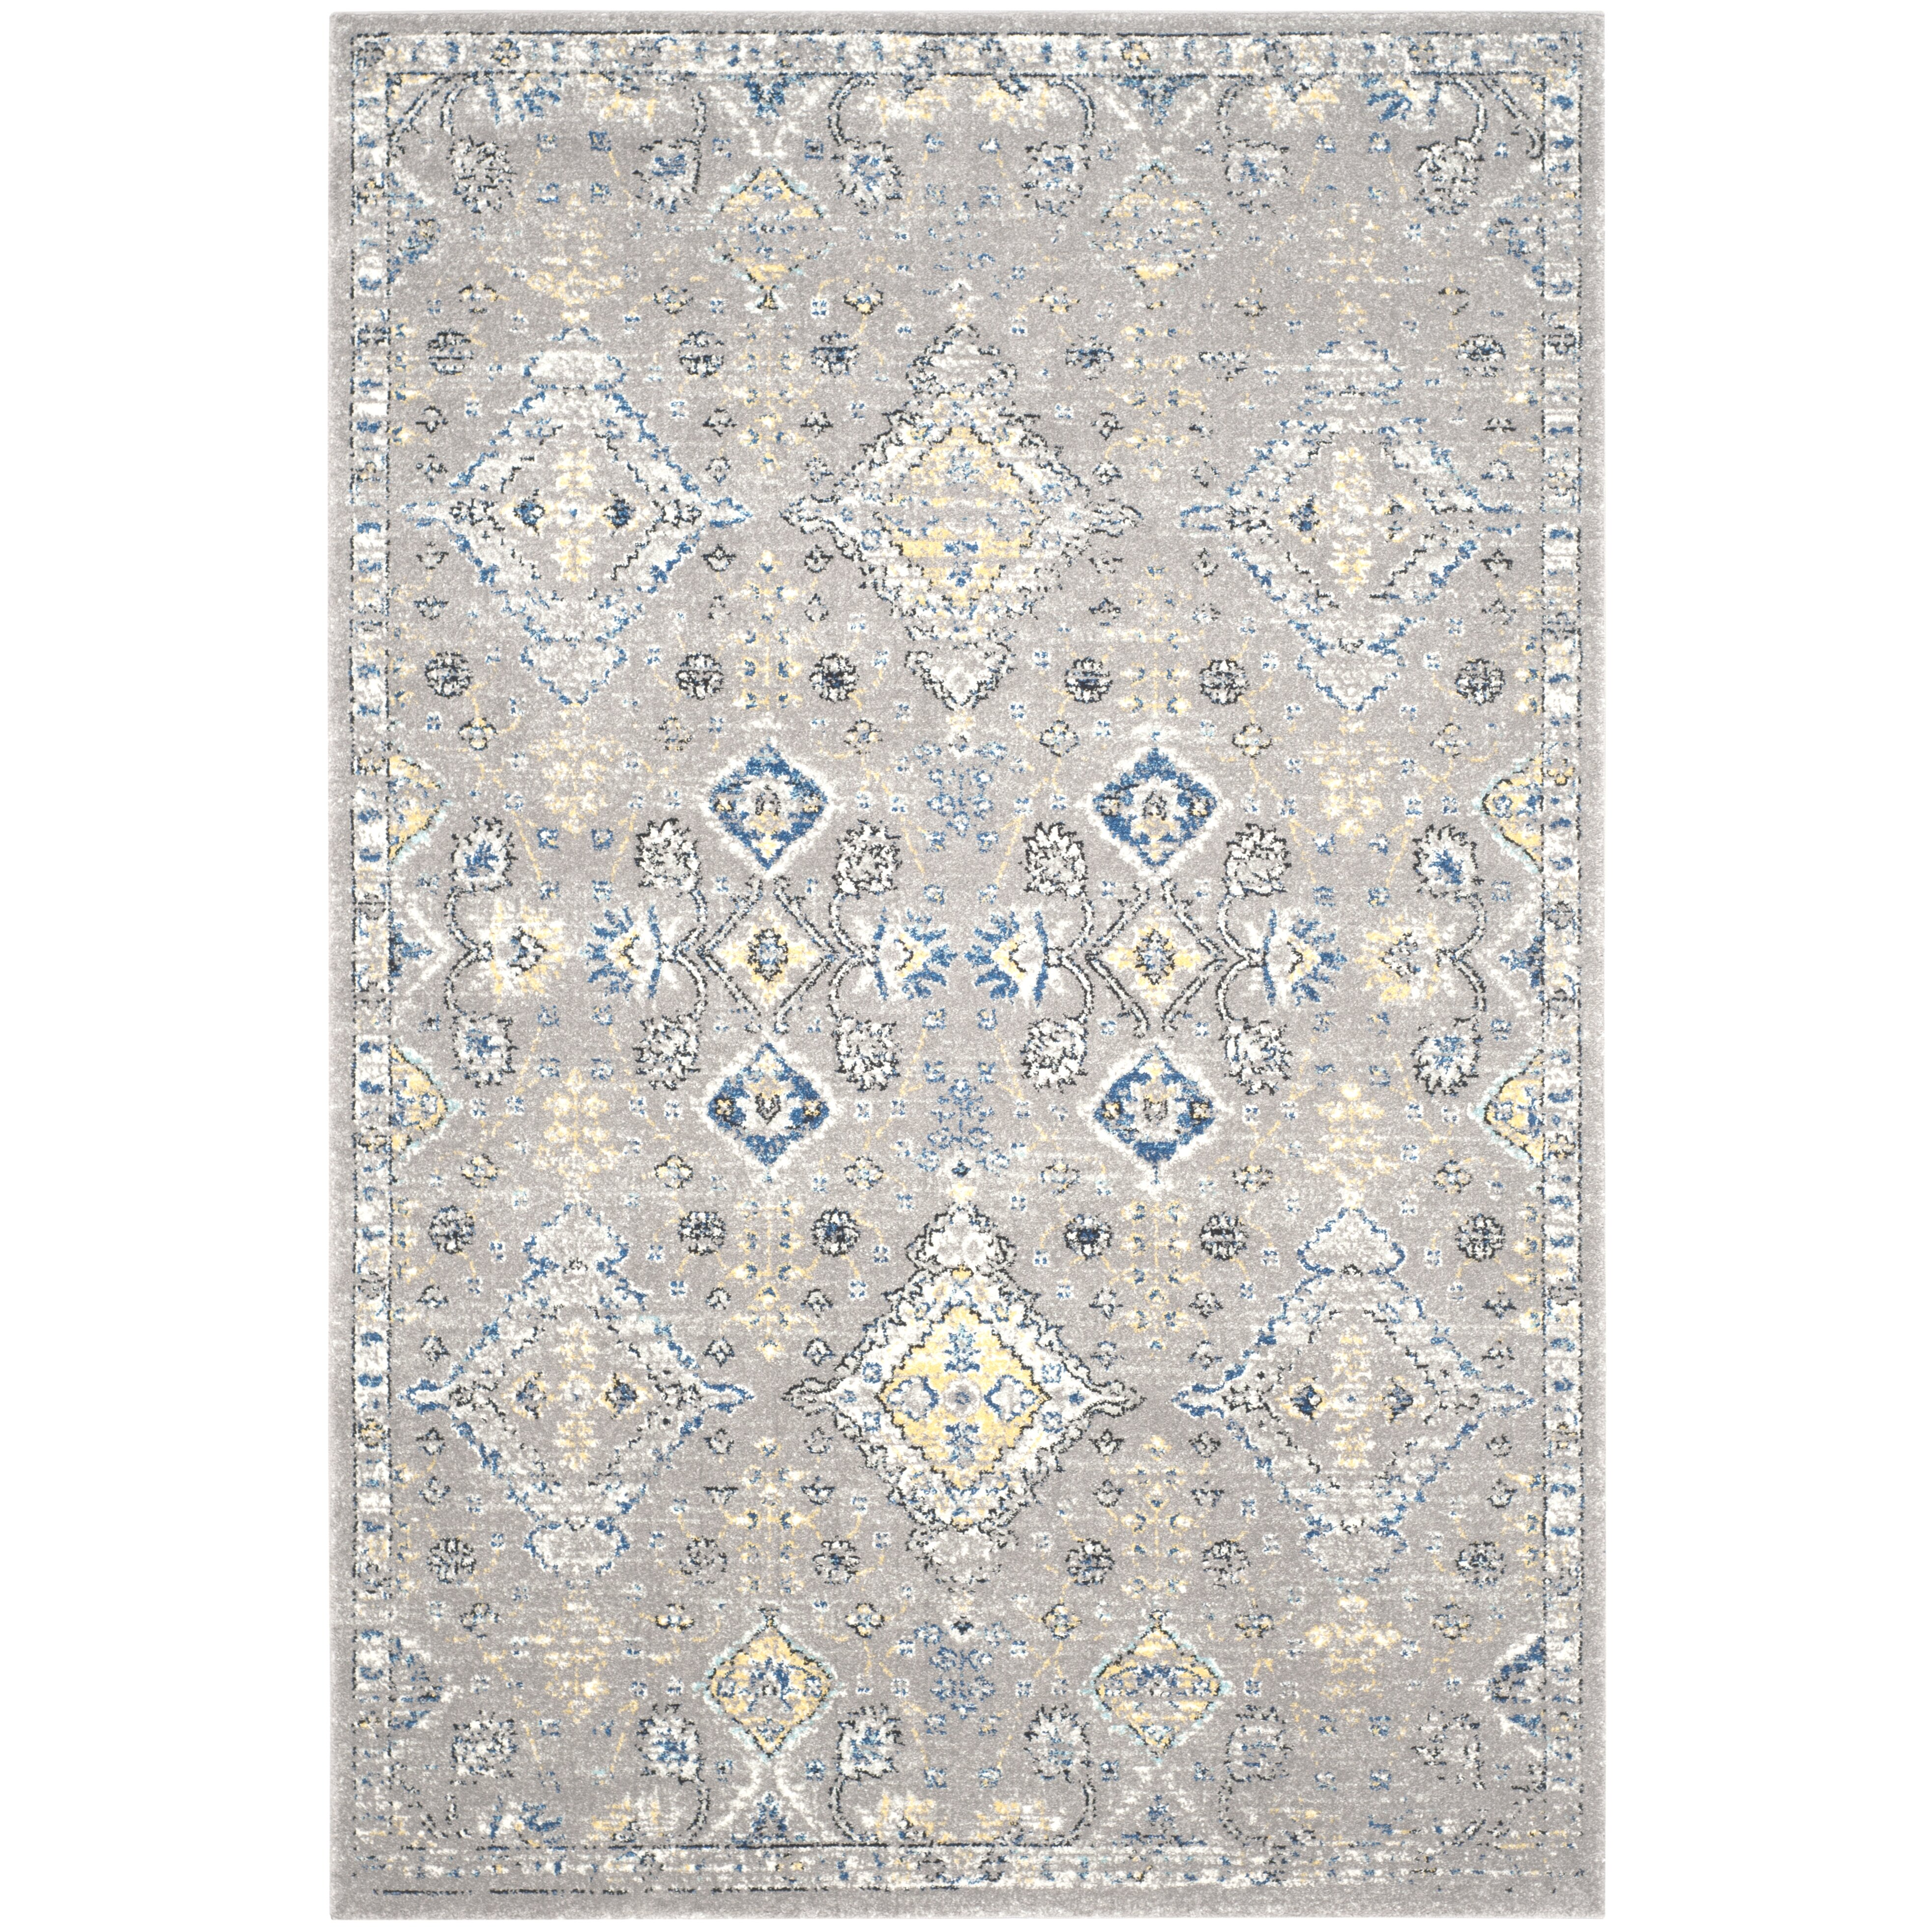 darby home co minonk dark gray yellow area rug reviews wayfair. Black Bedroom Furniture Sets. Home Design Ideas